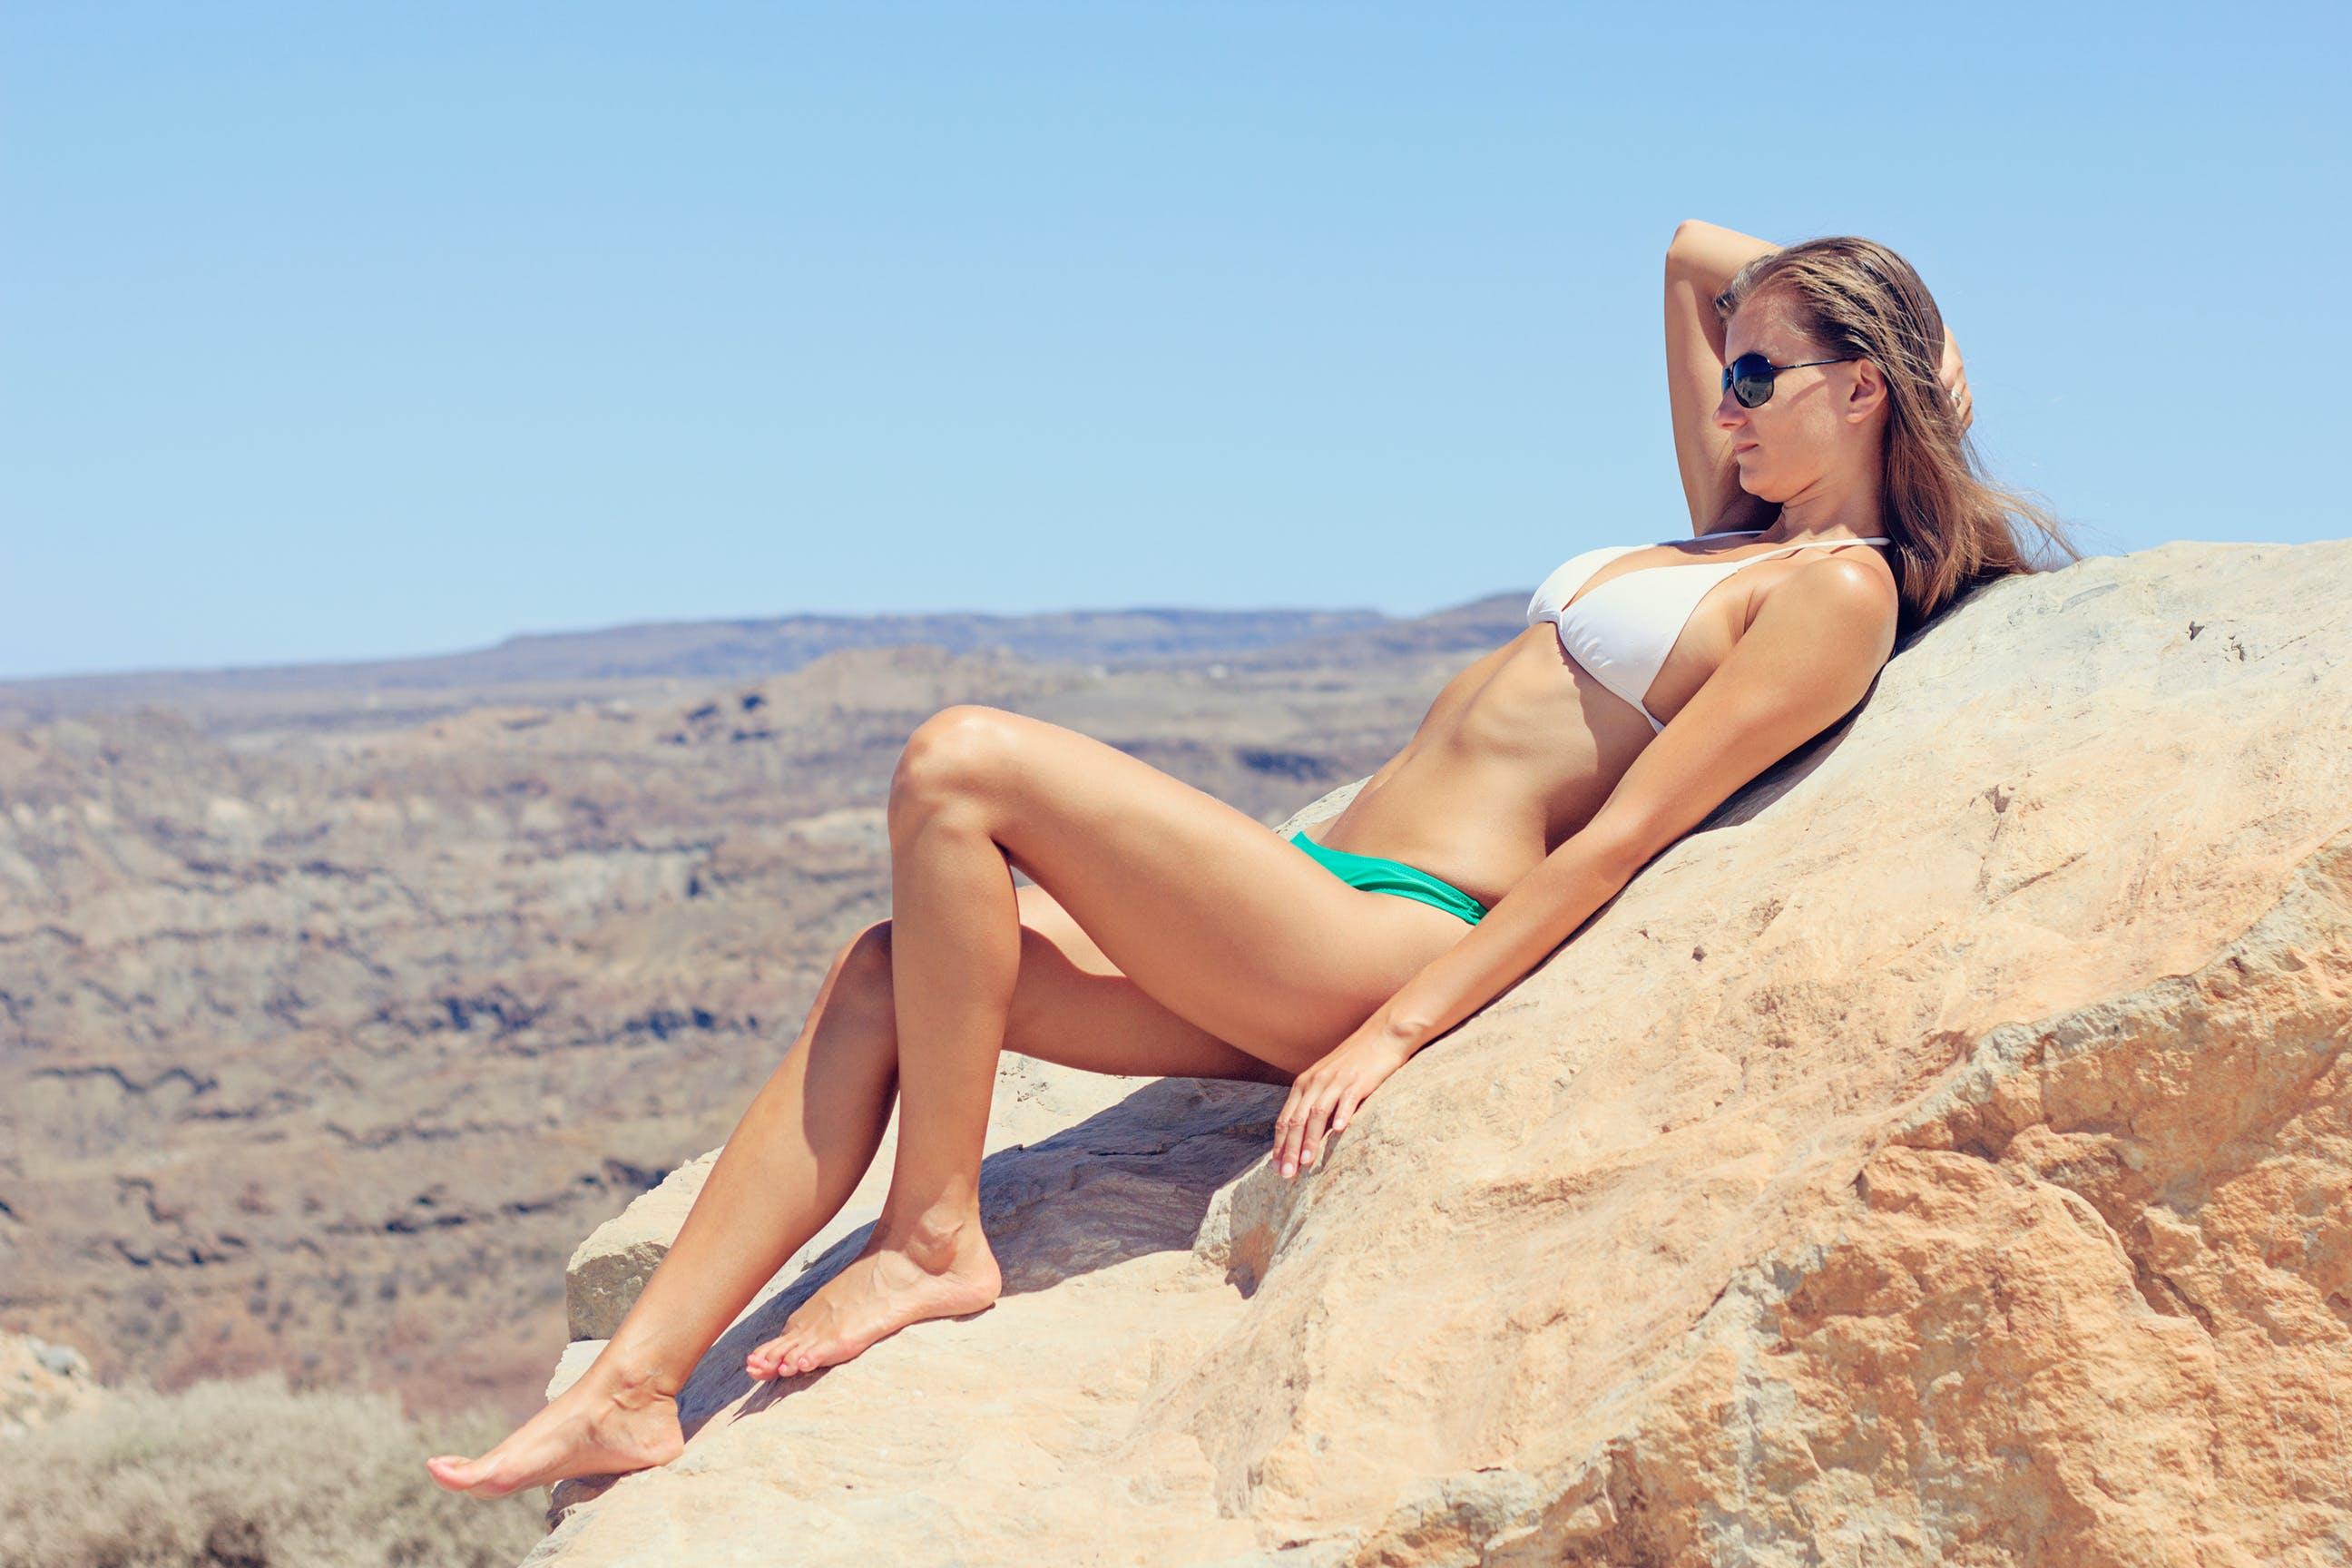 Kostenloses Stock Foto zu himmel, person, sonnenbrille, bikini